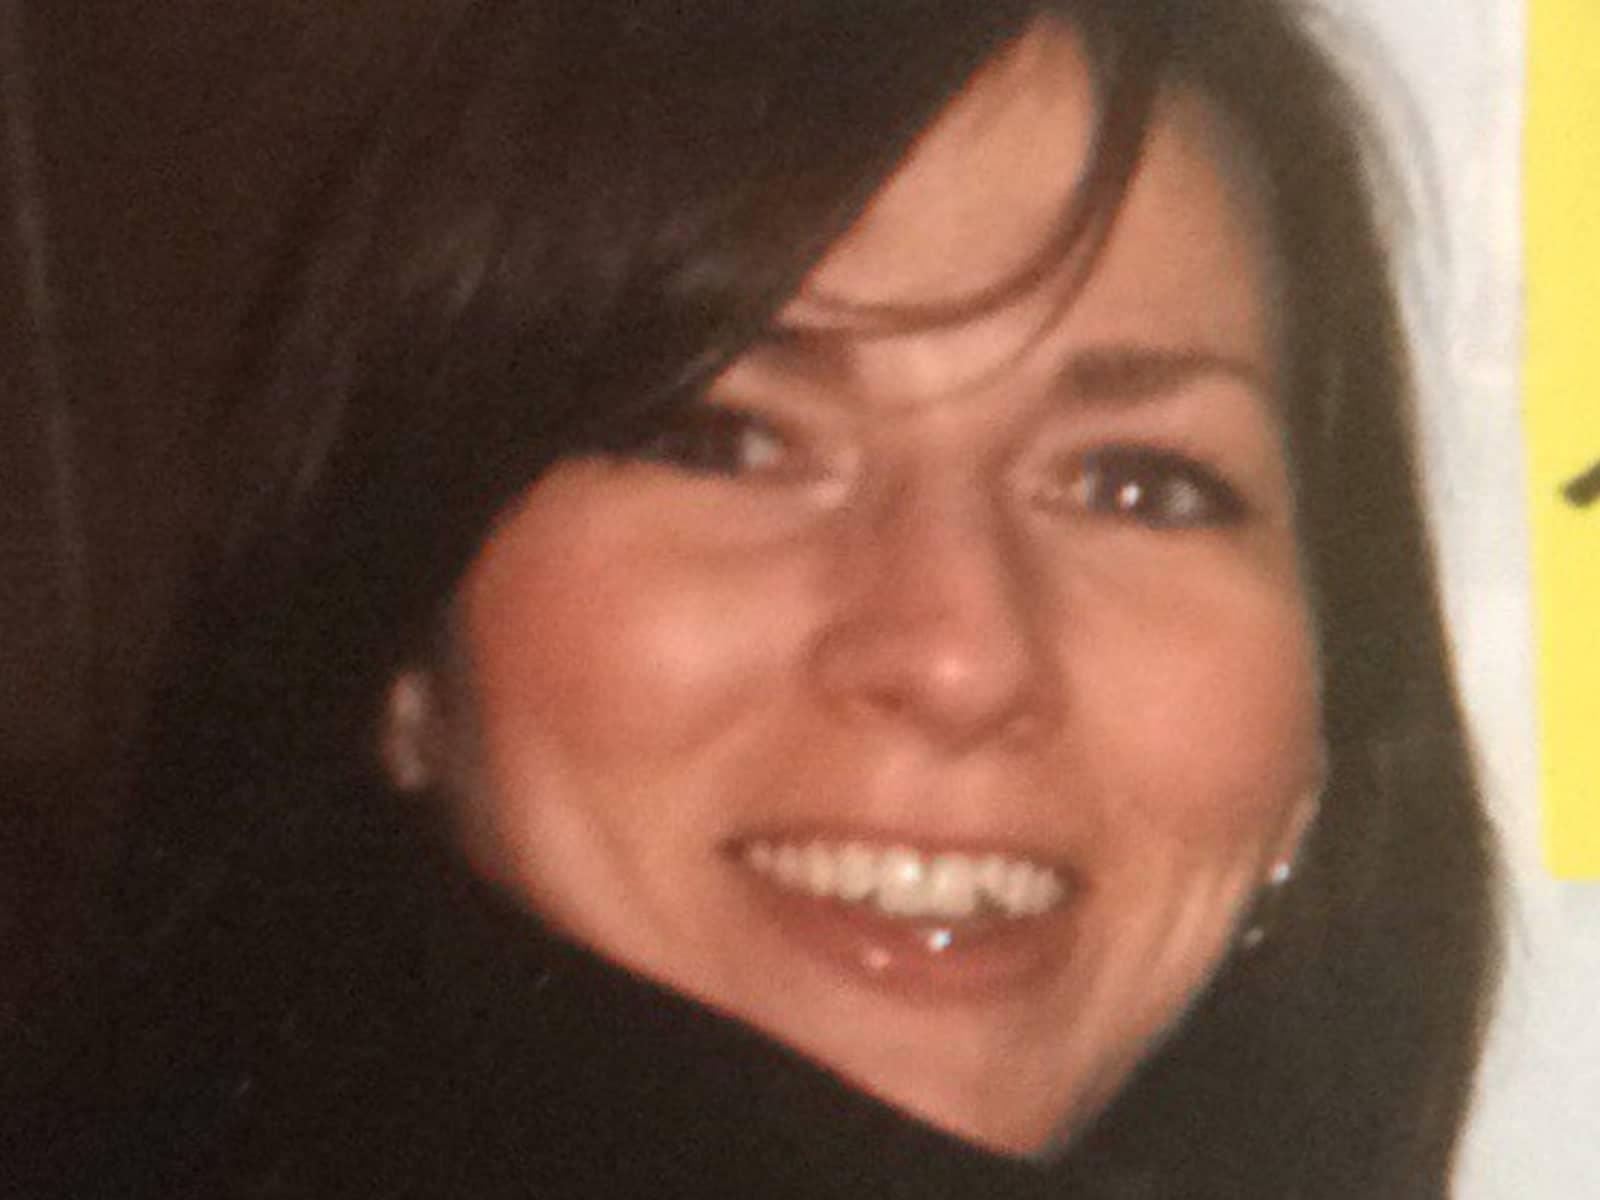 Lisa from Edmonton, Alberta, Canada